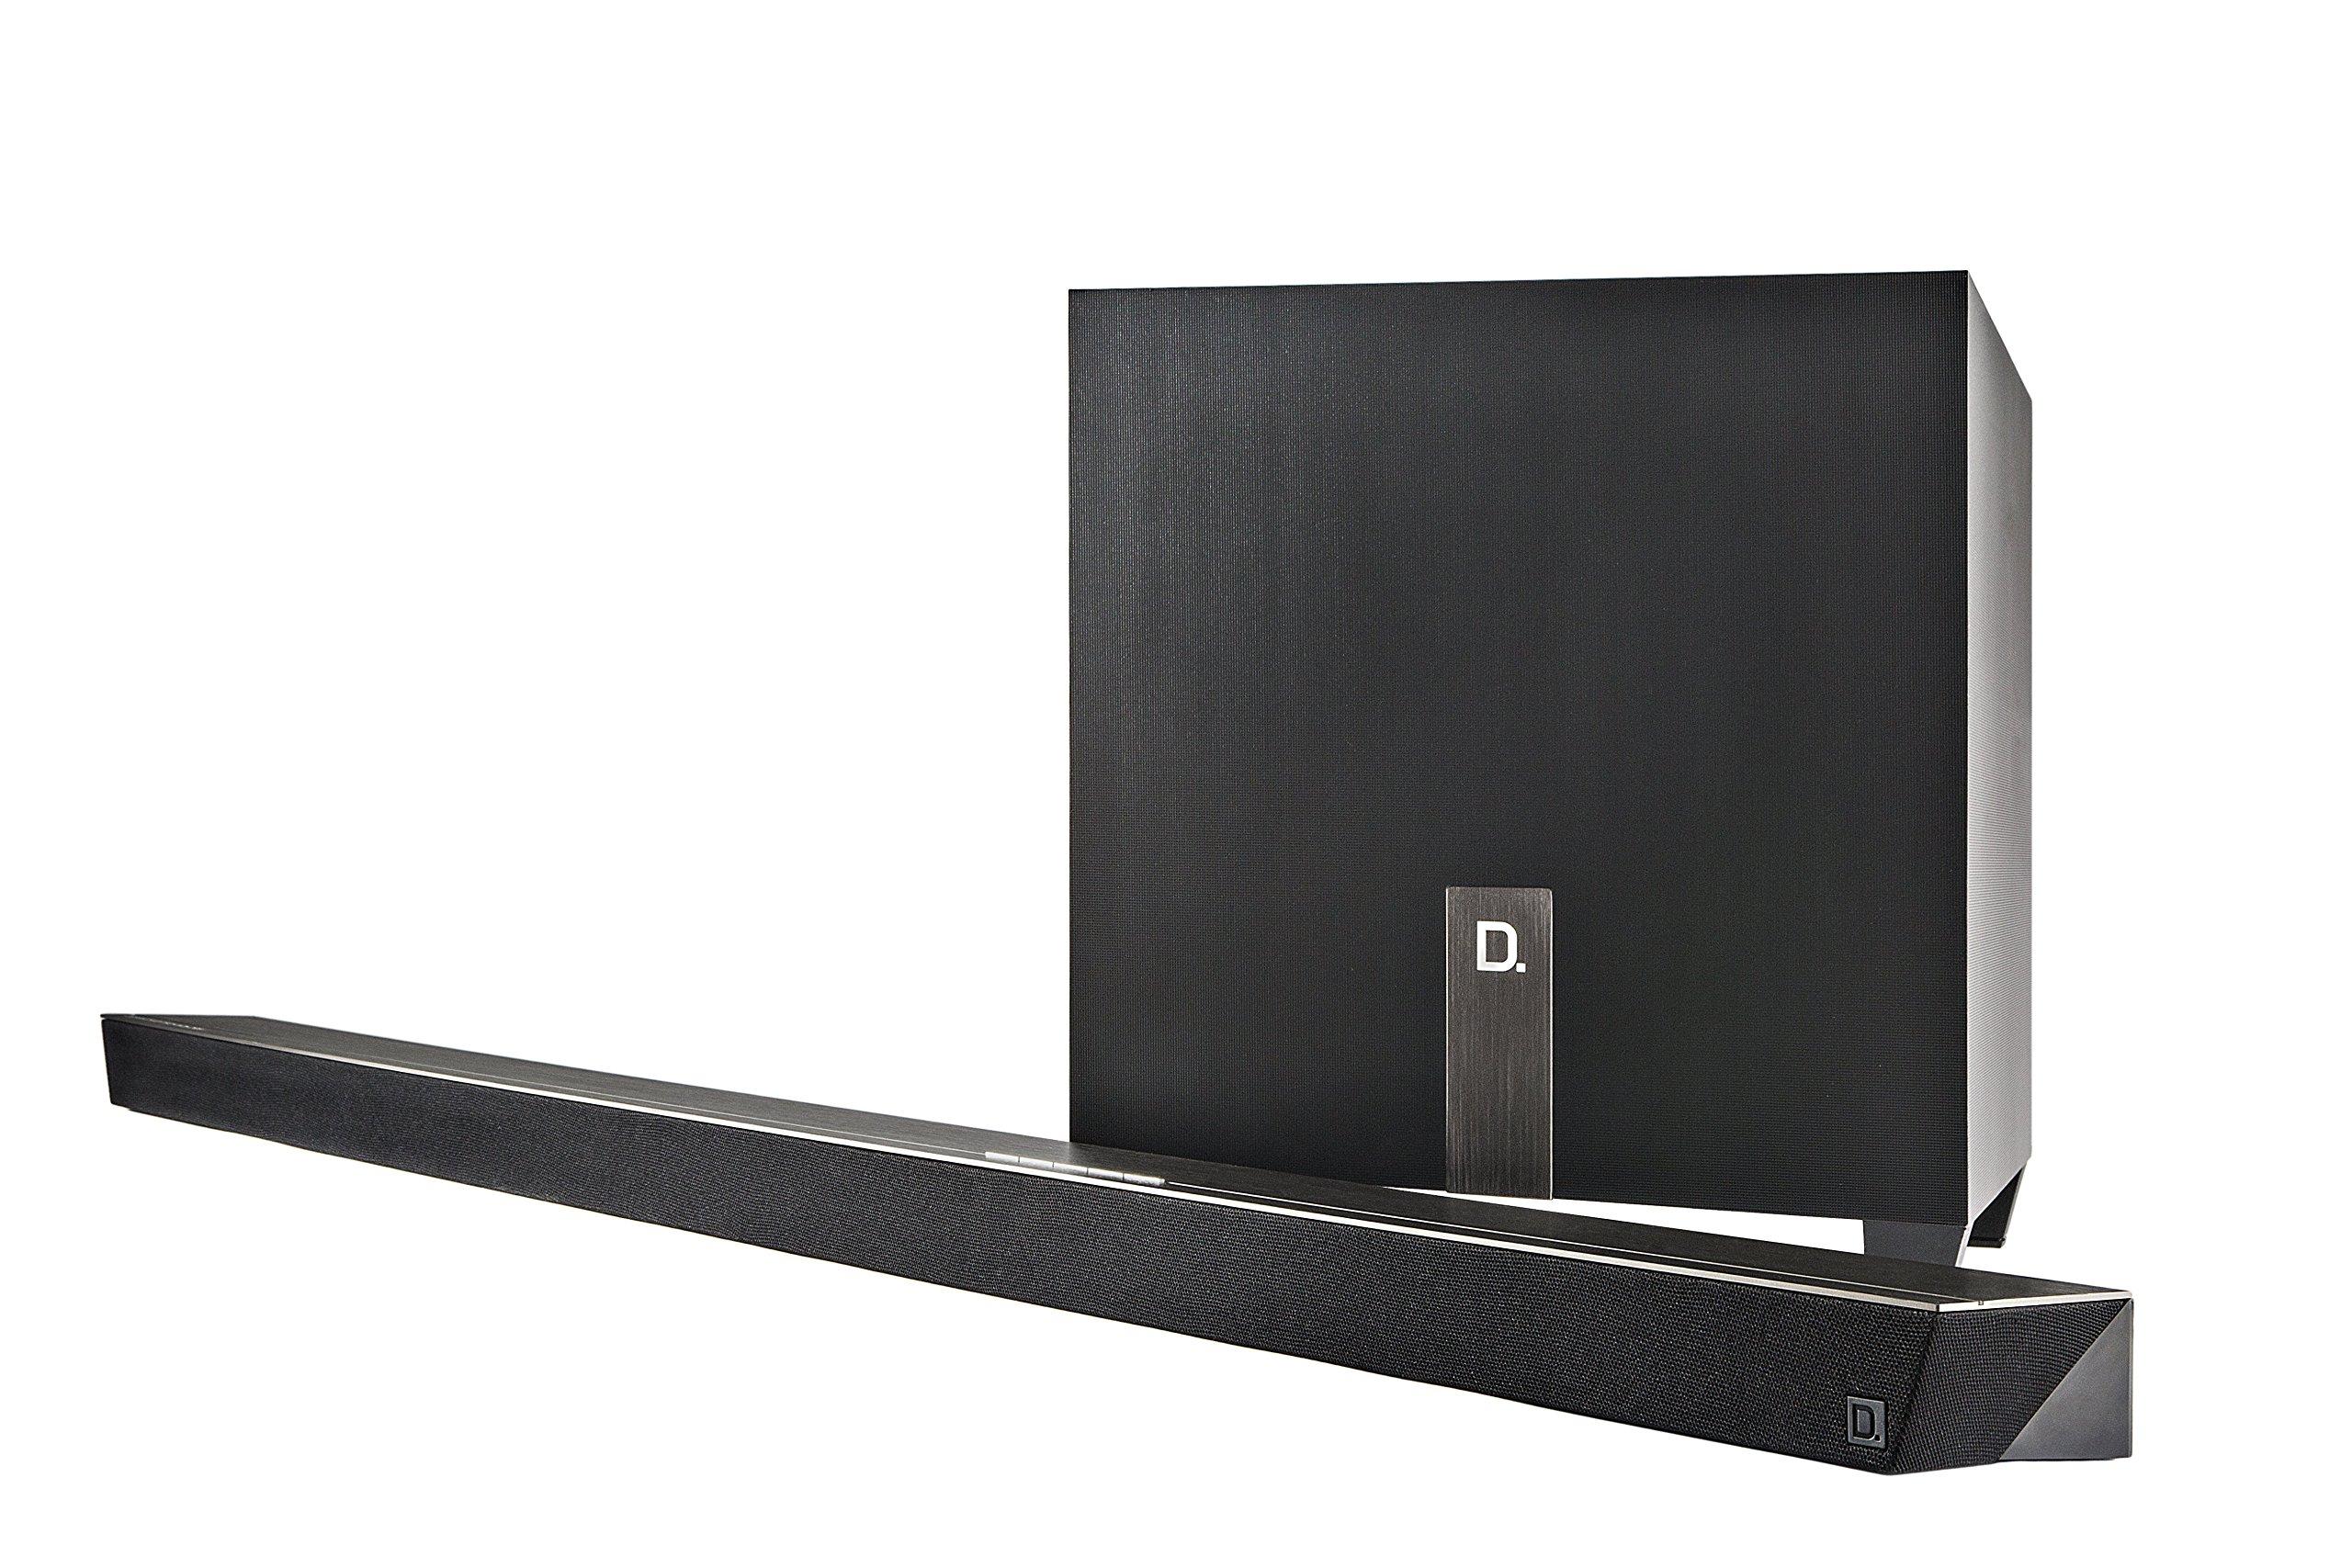 Definitive Technology W Studio Micro Ultra-Slim 3.1 Wireless Sound Bar & Wi-Fi Music Streaming System by Definitive Technology